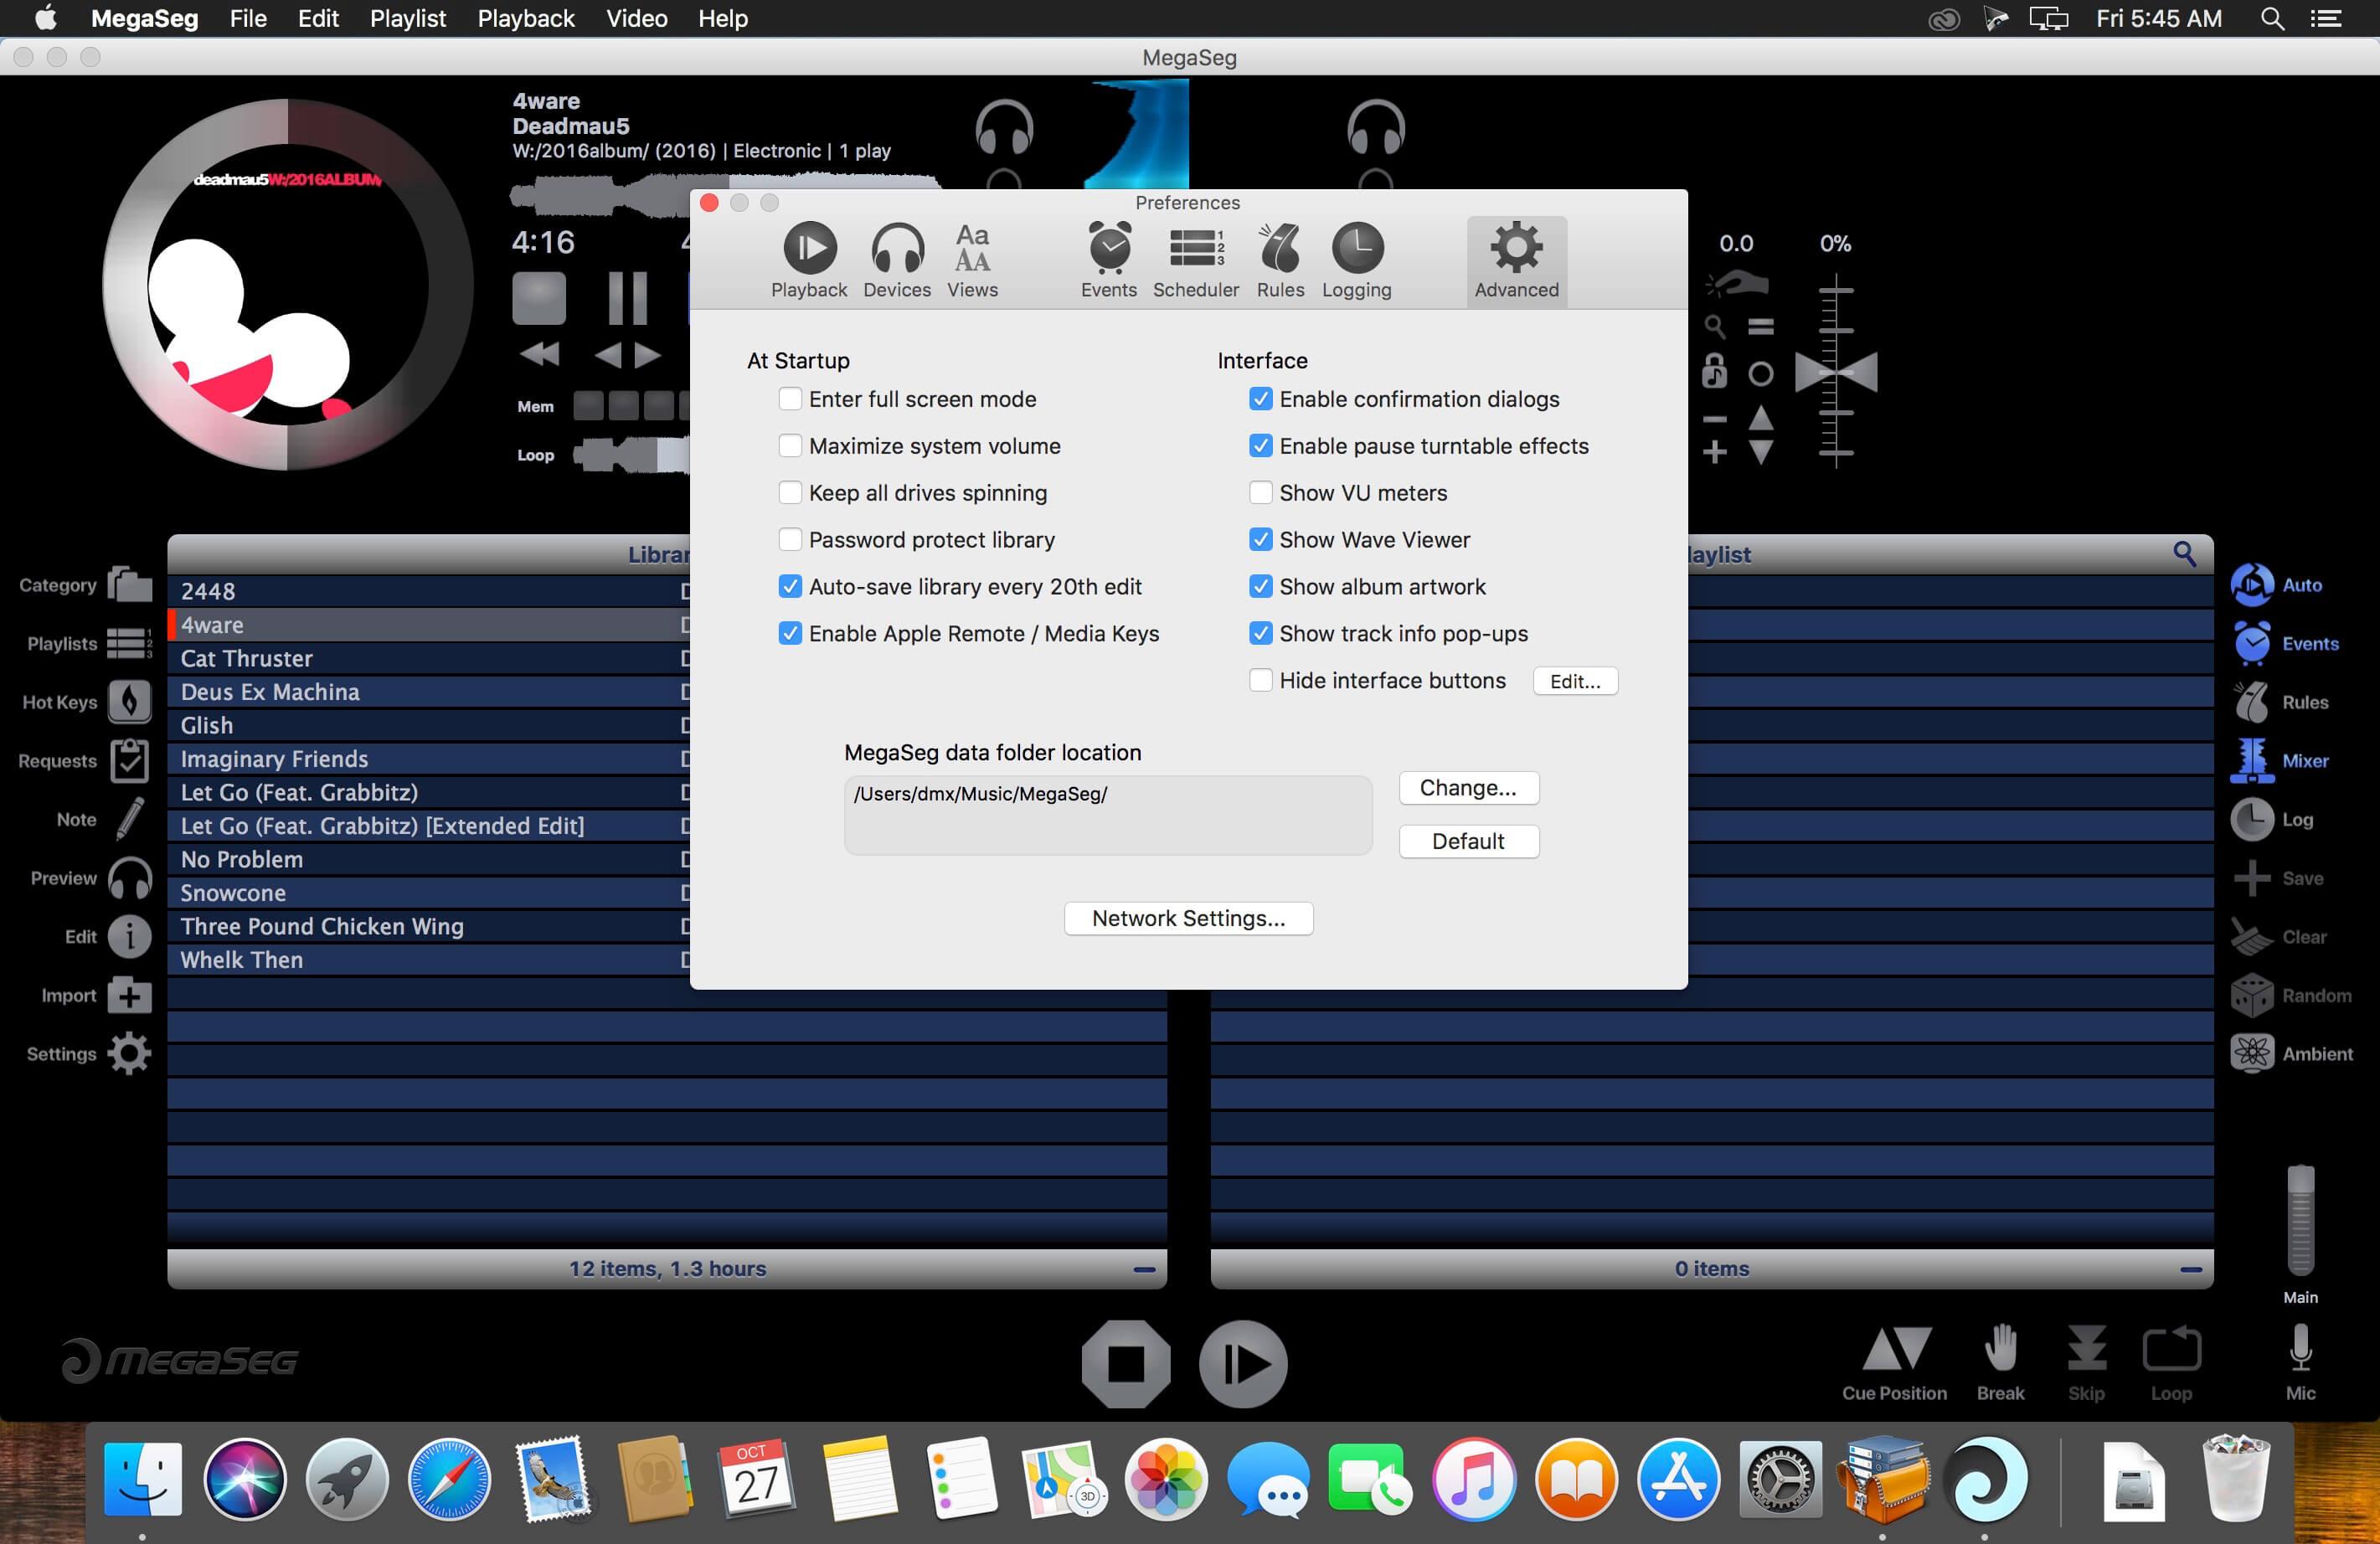 Descarga Fidelity Media MegaSeg Pro 5